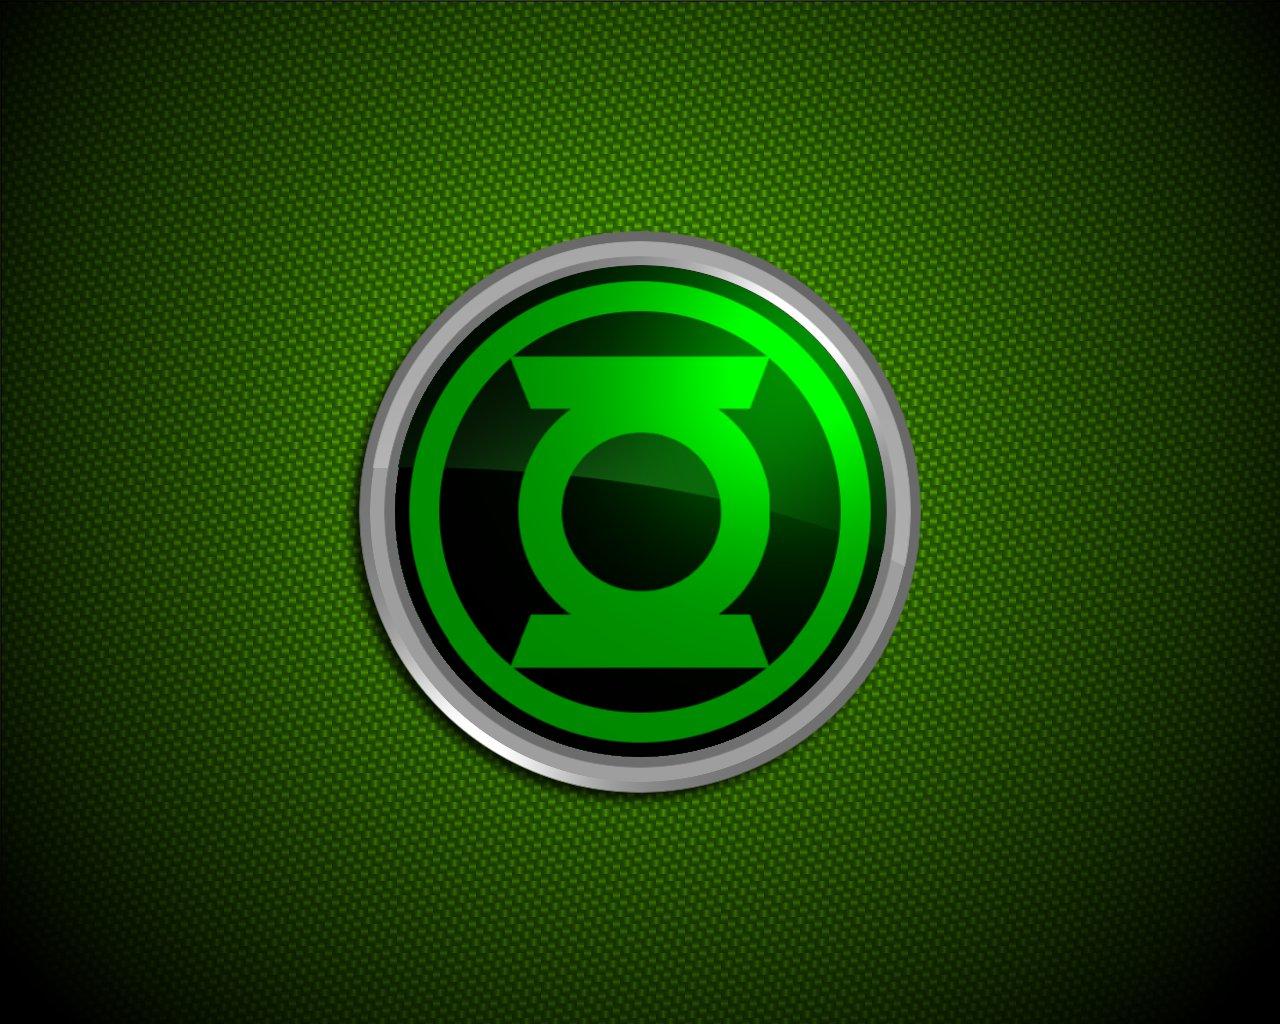 Kelly Blog green lantern wallpaper hd 1280x1024